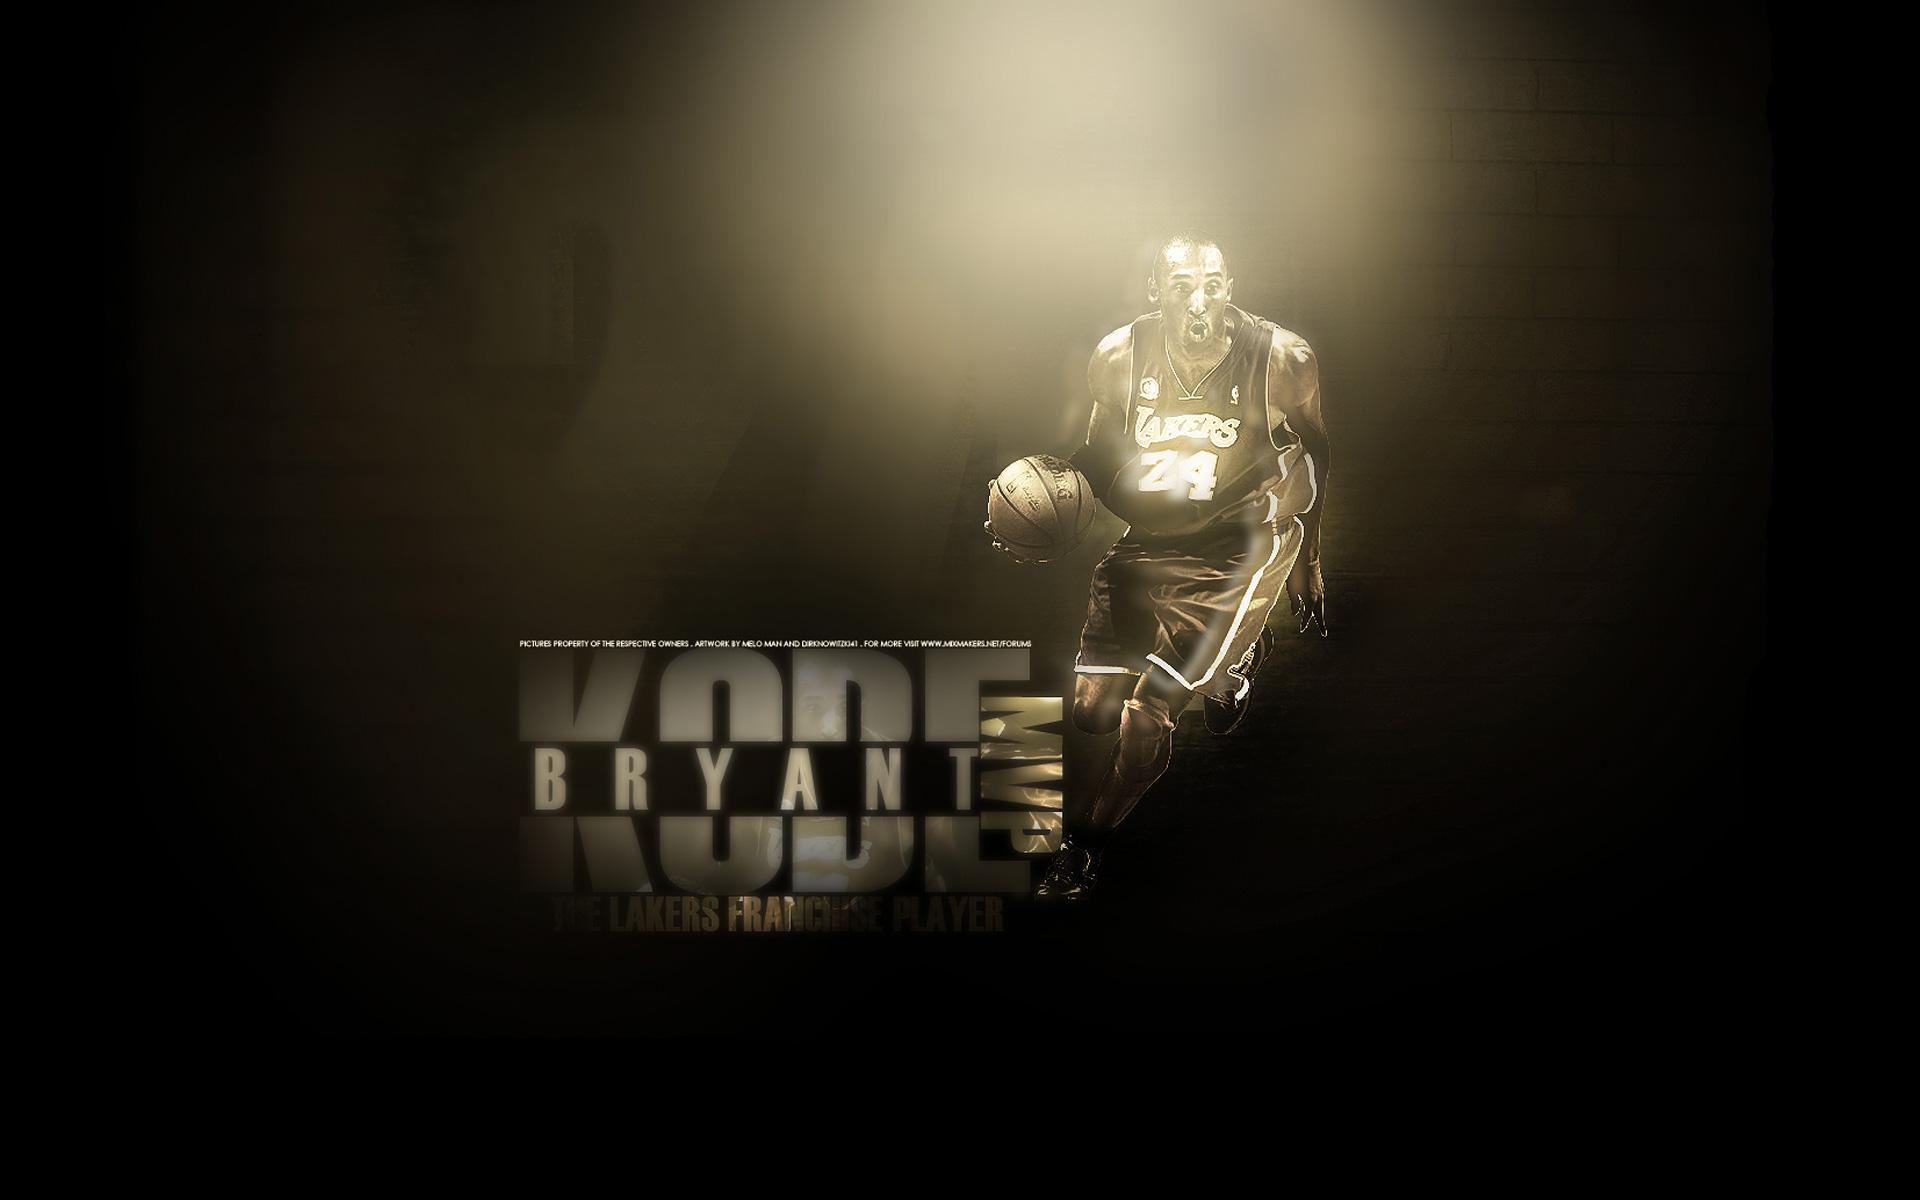 Kobe-Bryant-MVP-Wallpaper.jpg